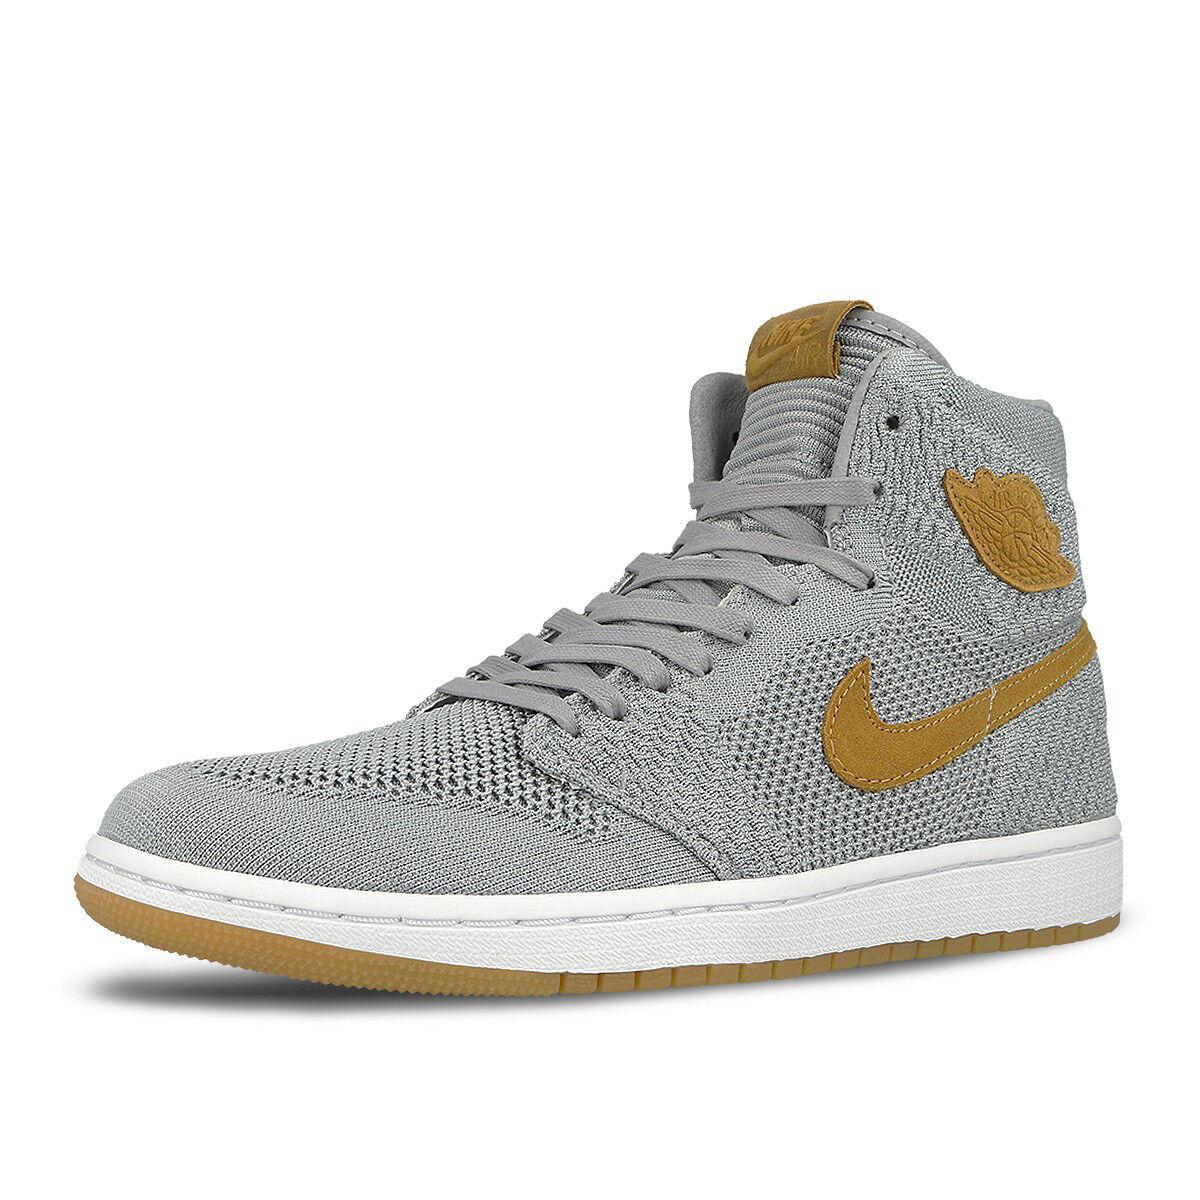 Nike air jordan retro - 1 uomini lupo grigio flyknit raccolto 919704-025 us7-11 04